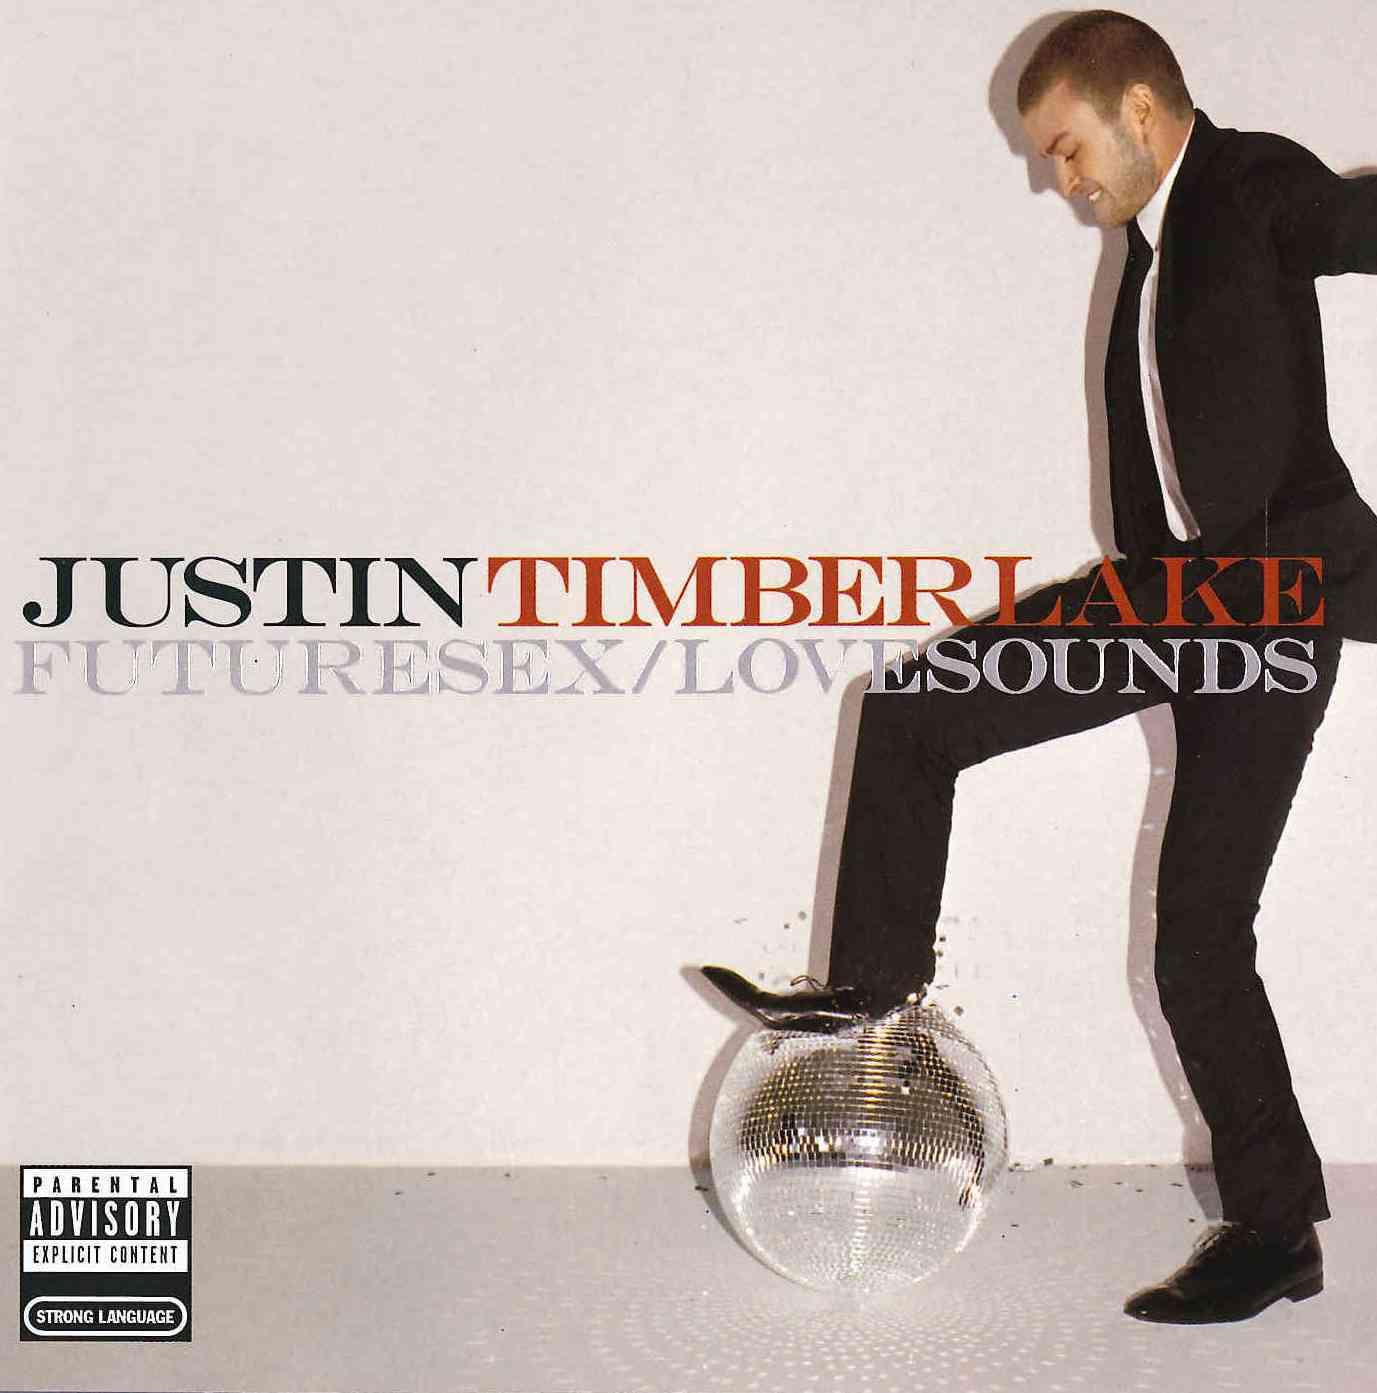 Justin Timberlake - FutureSex/Love Sounds (Parental Advisory)